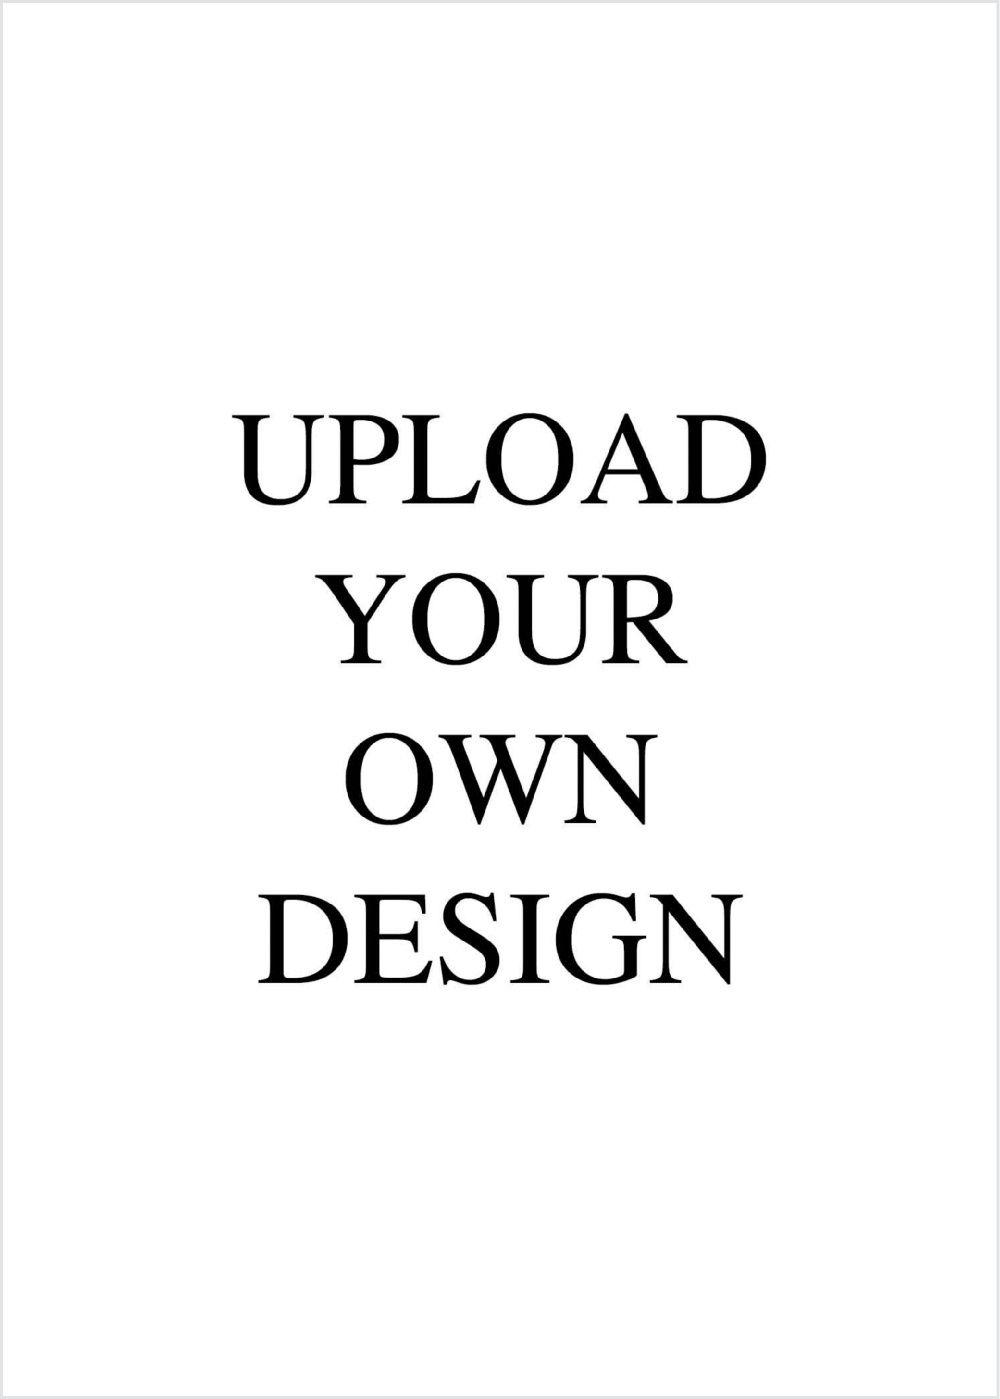 Upload Your Own Design 5x7 Portrait Wedding Invitation   Portraits ...